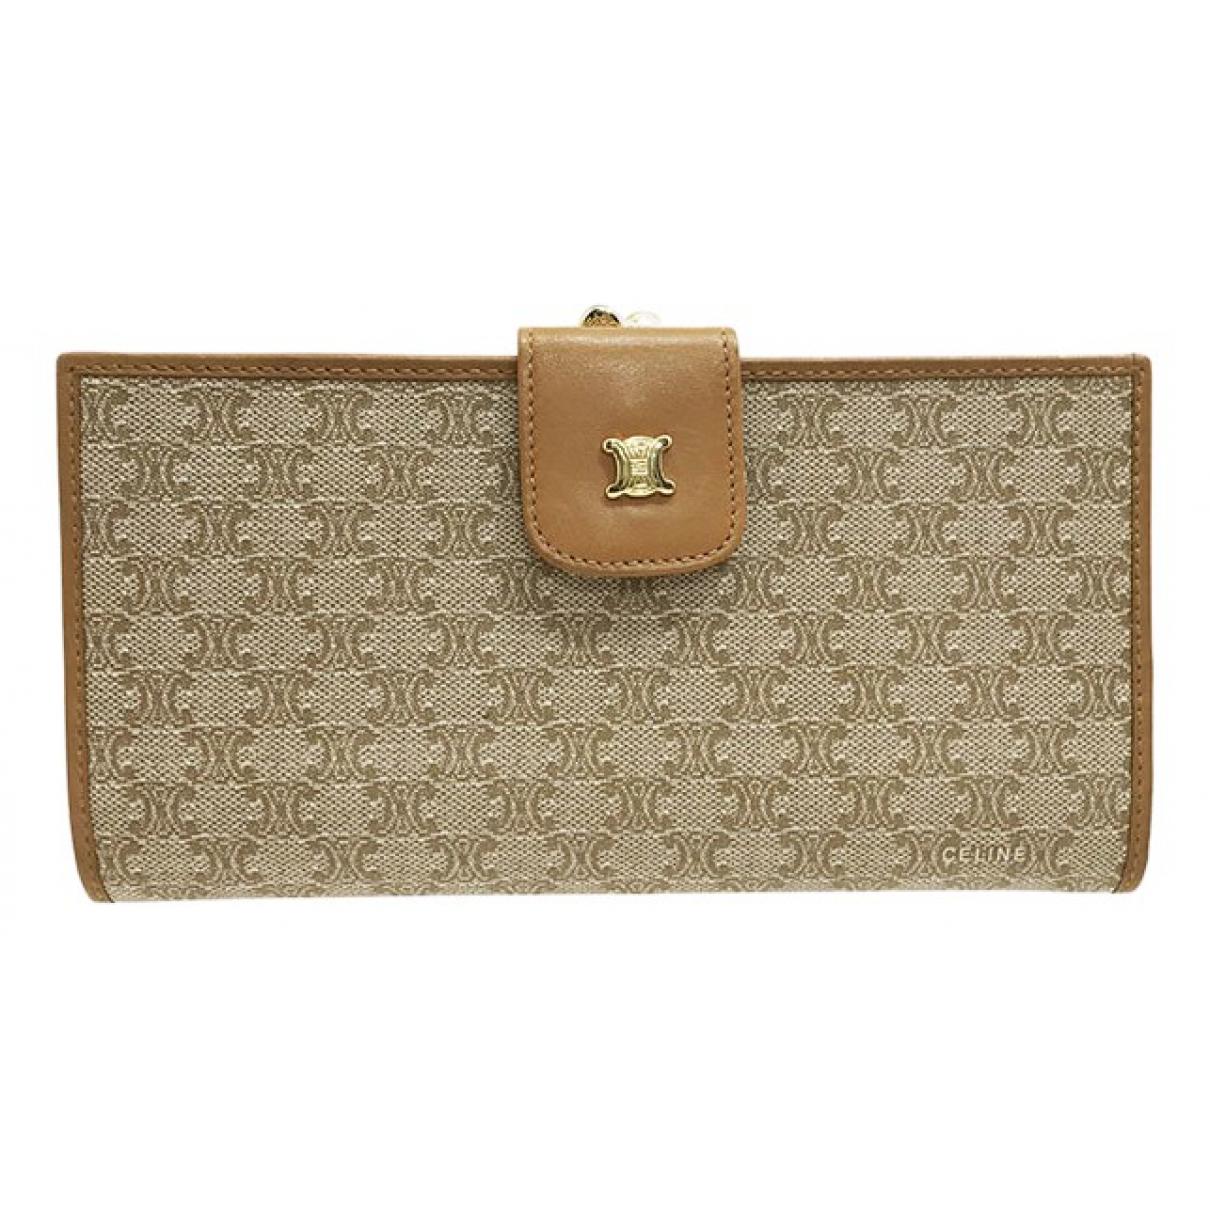 Celine \N Beige Cloth wallet for Women \N